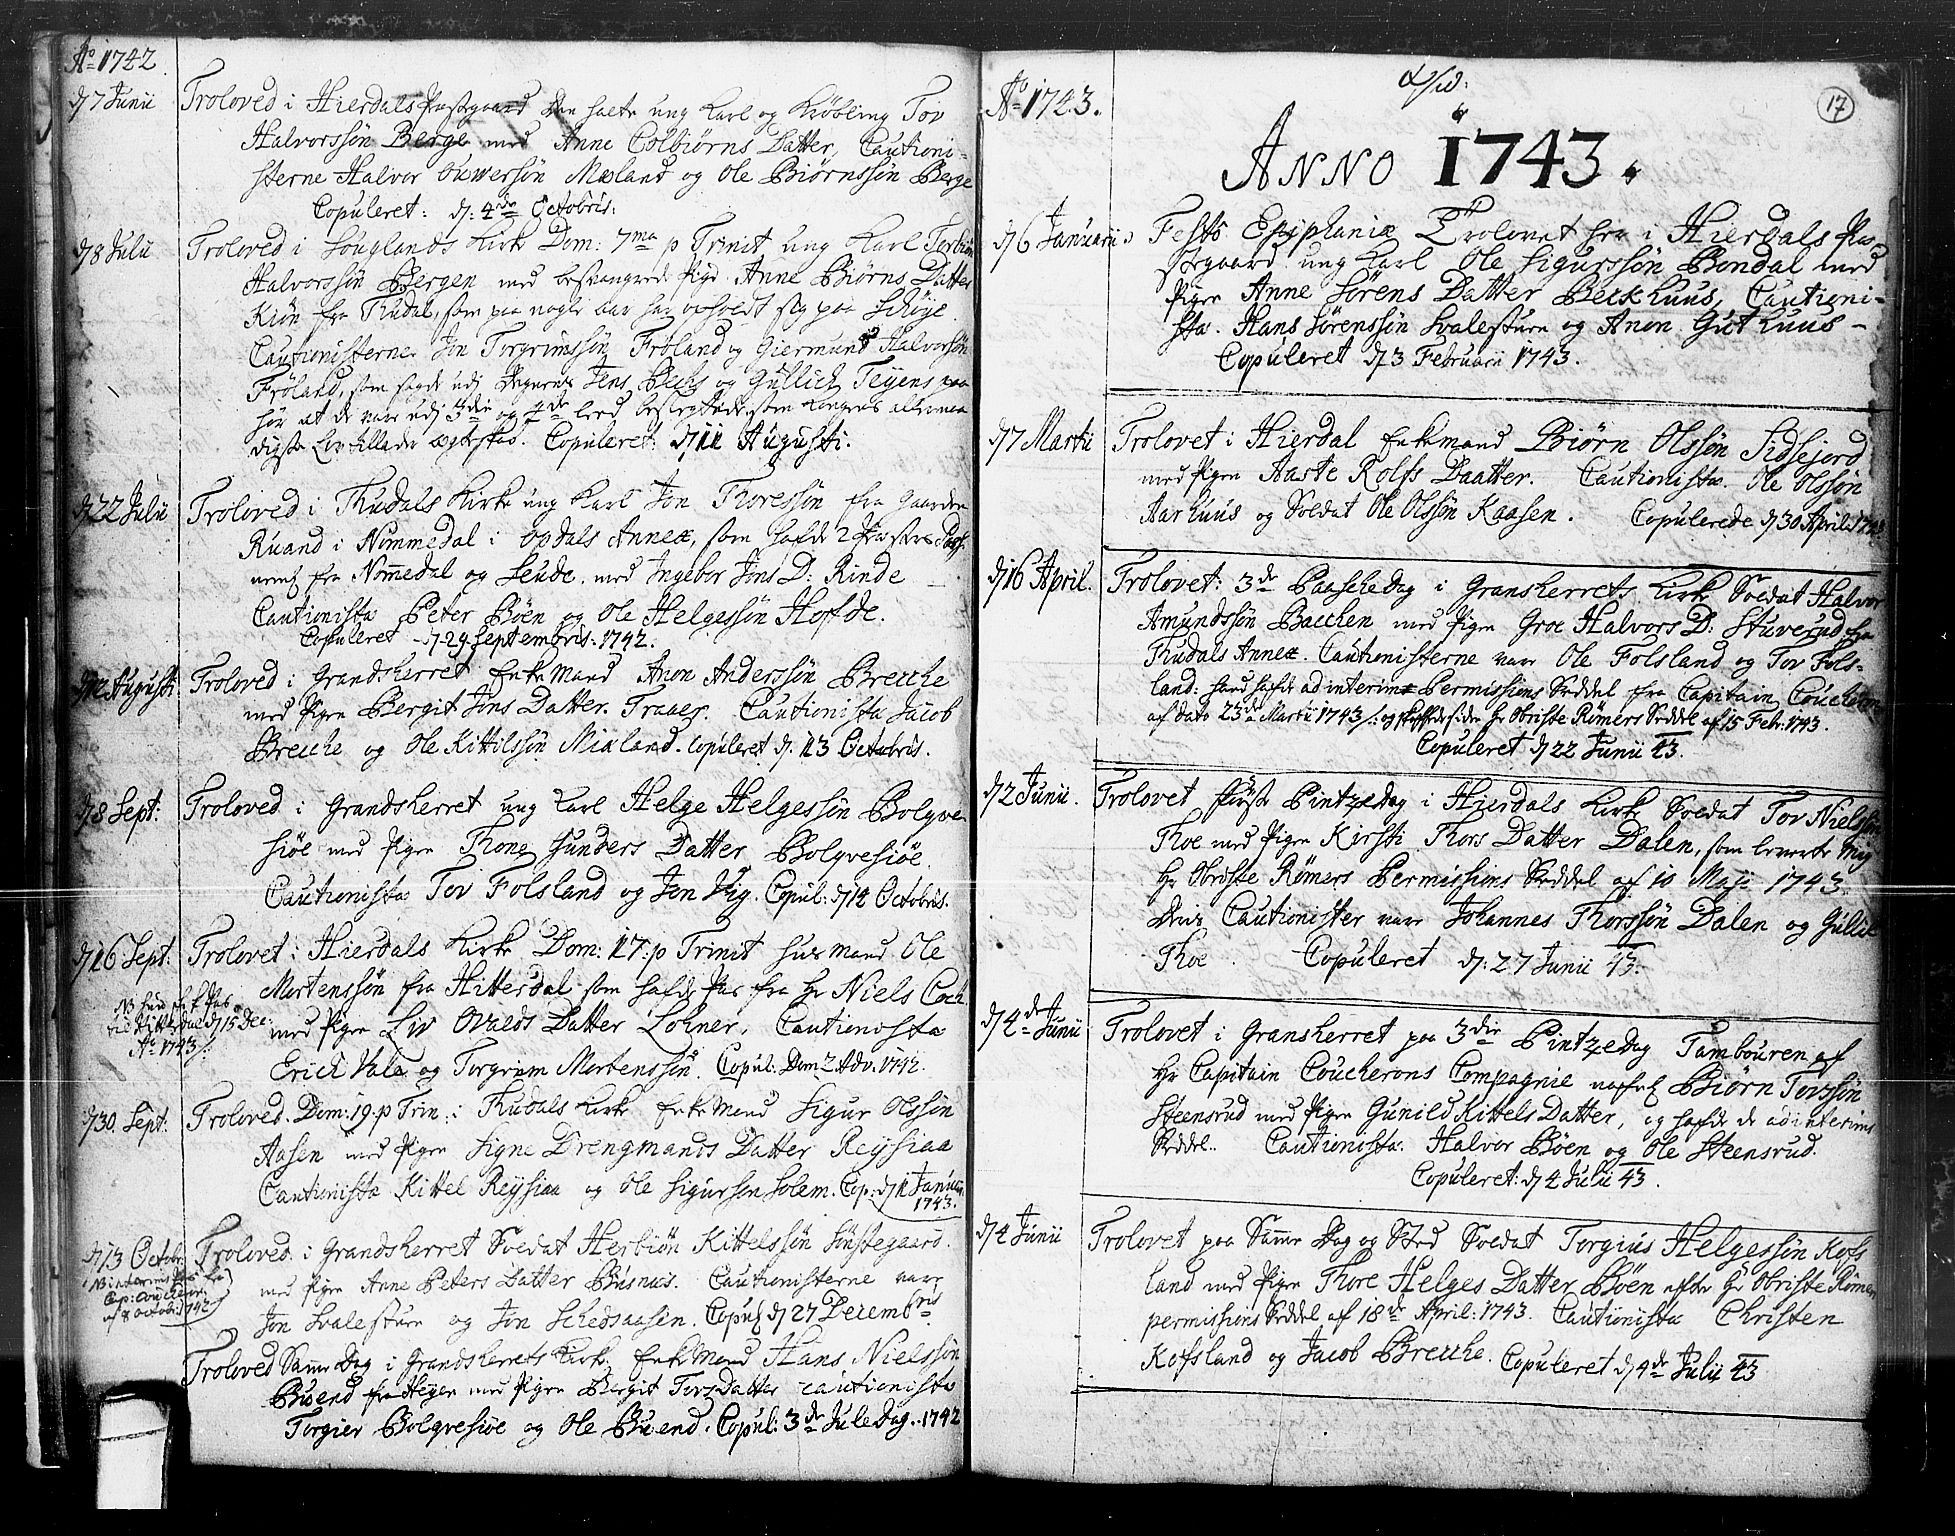 SAKO, Hjartdal kirkebøker, F/Fa/L0004: Ministerialbok nr. I 4, 1727-1795, s. 17